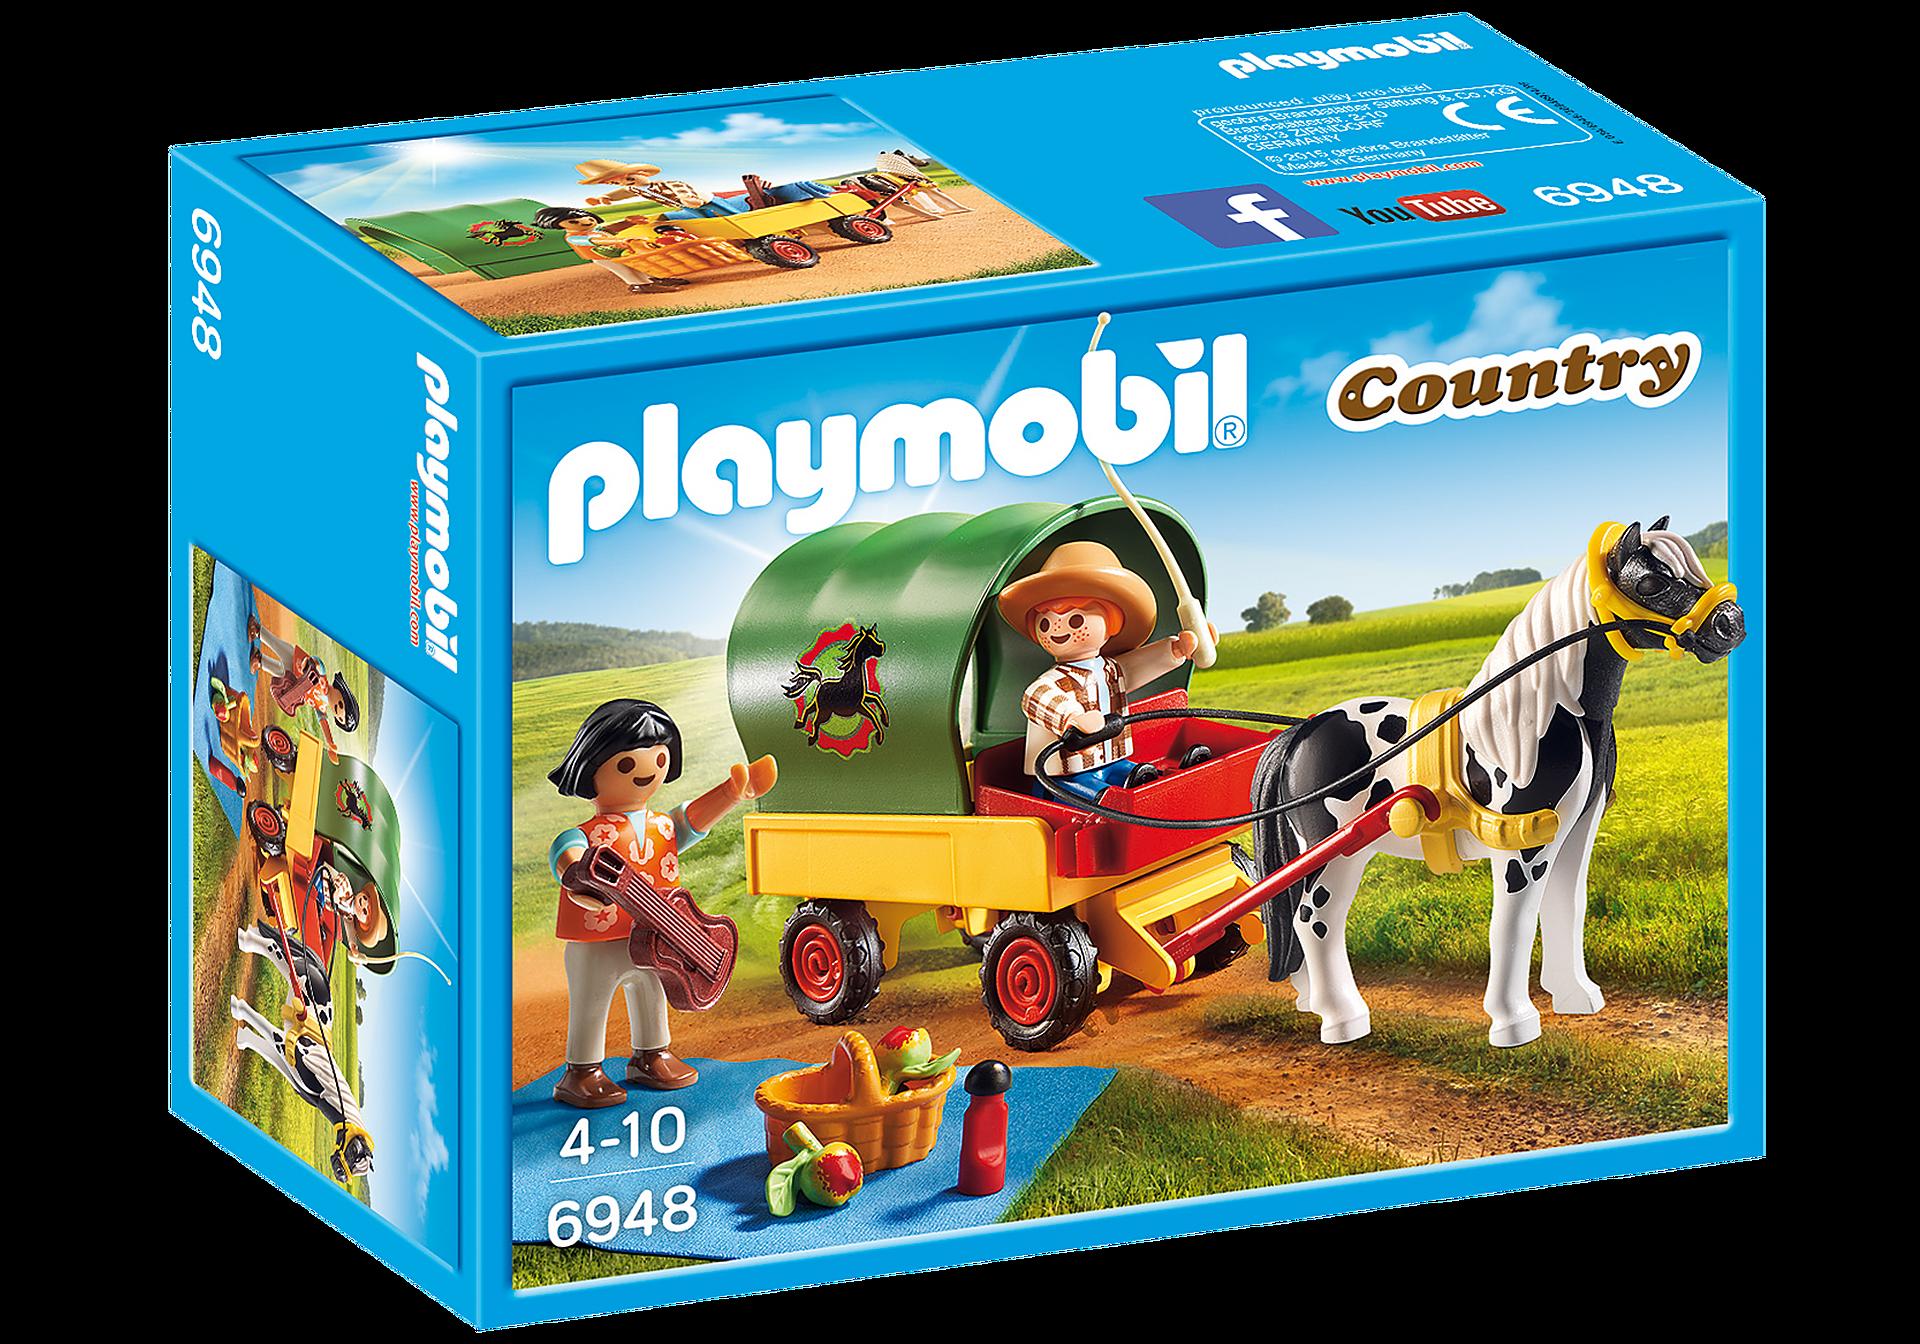 http://media.playmobil.com/i/playmobil/6948_product_box_front/Picnic con Poni y Carro